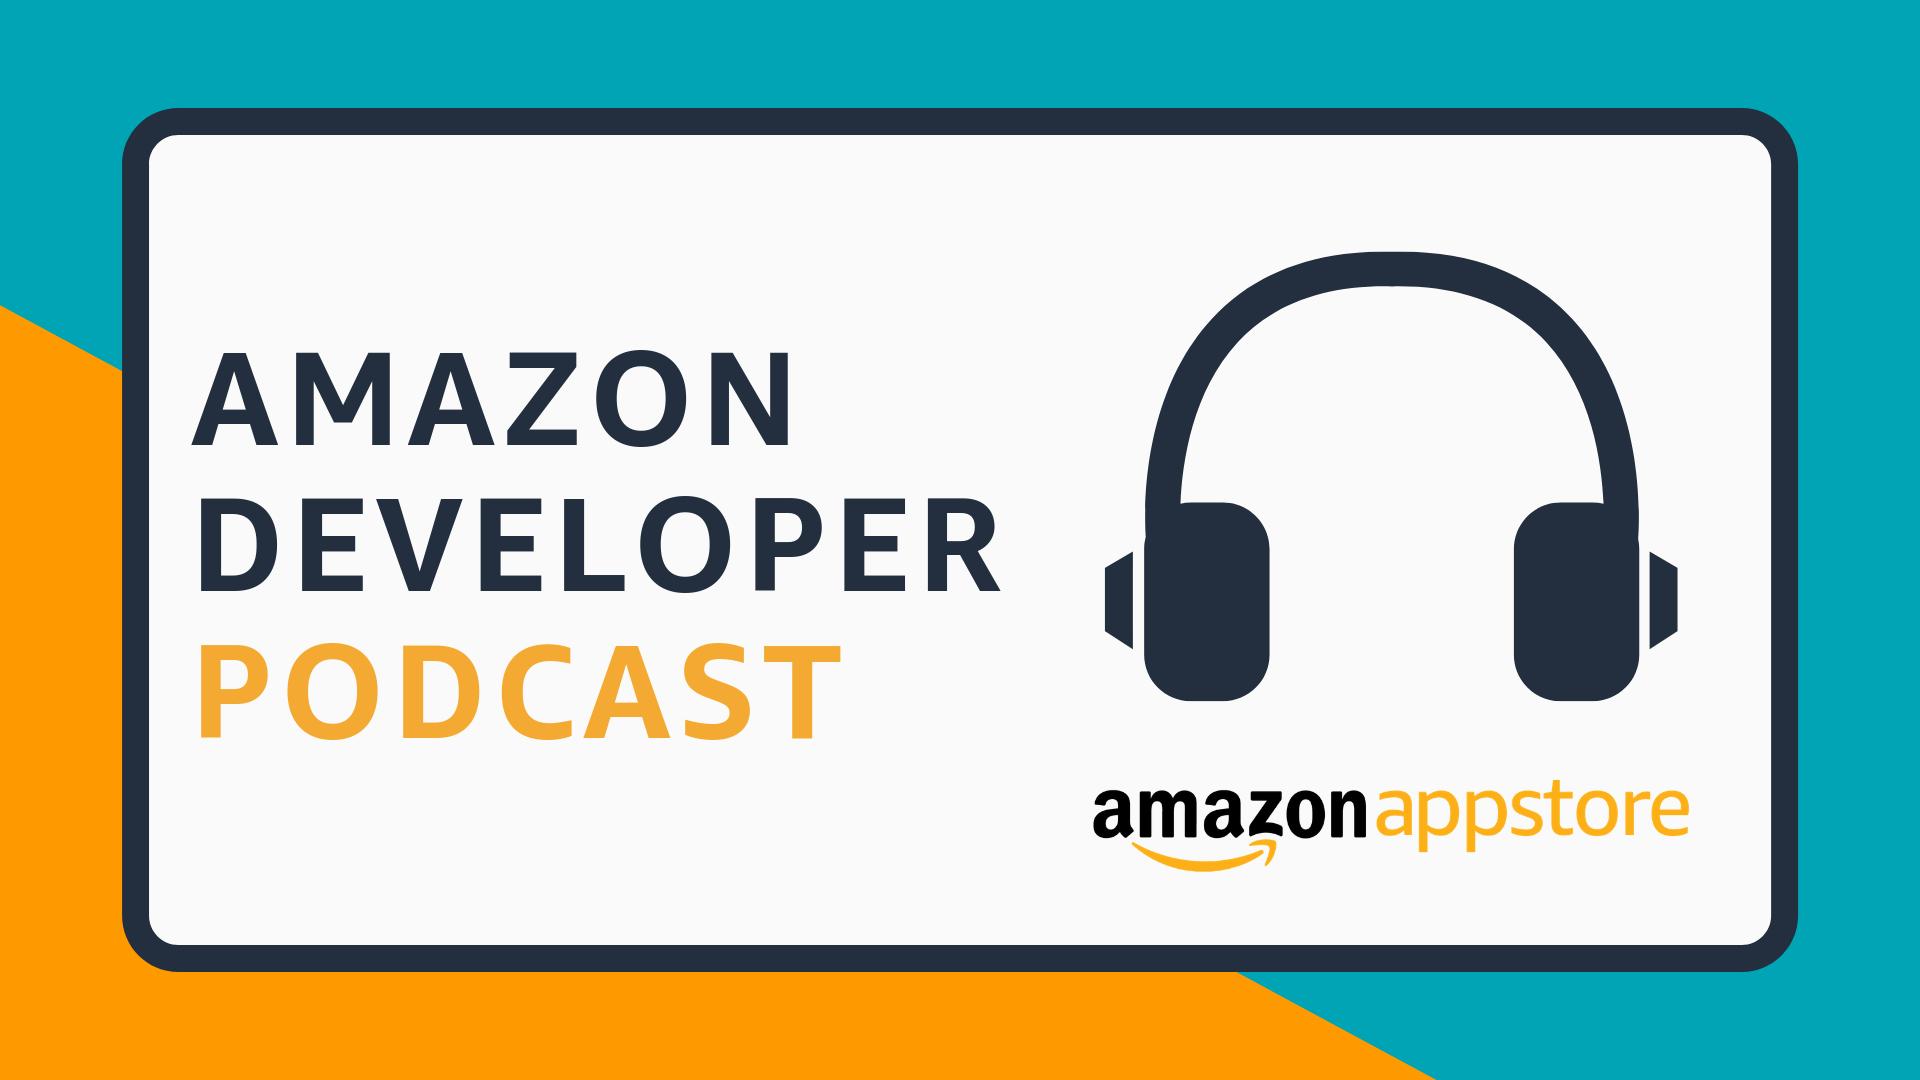 AMAZON_Developer_Podcast.png